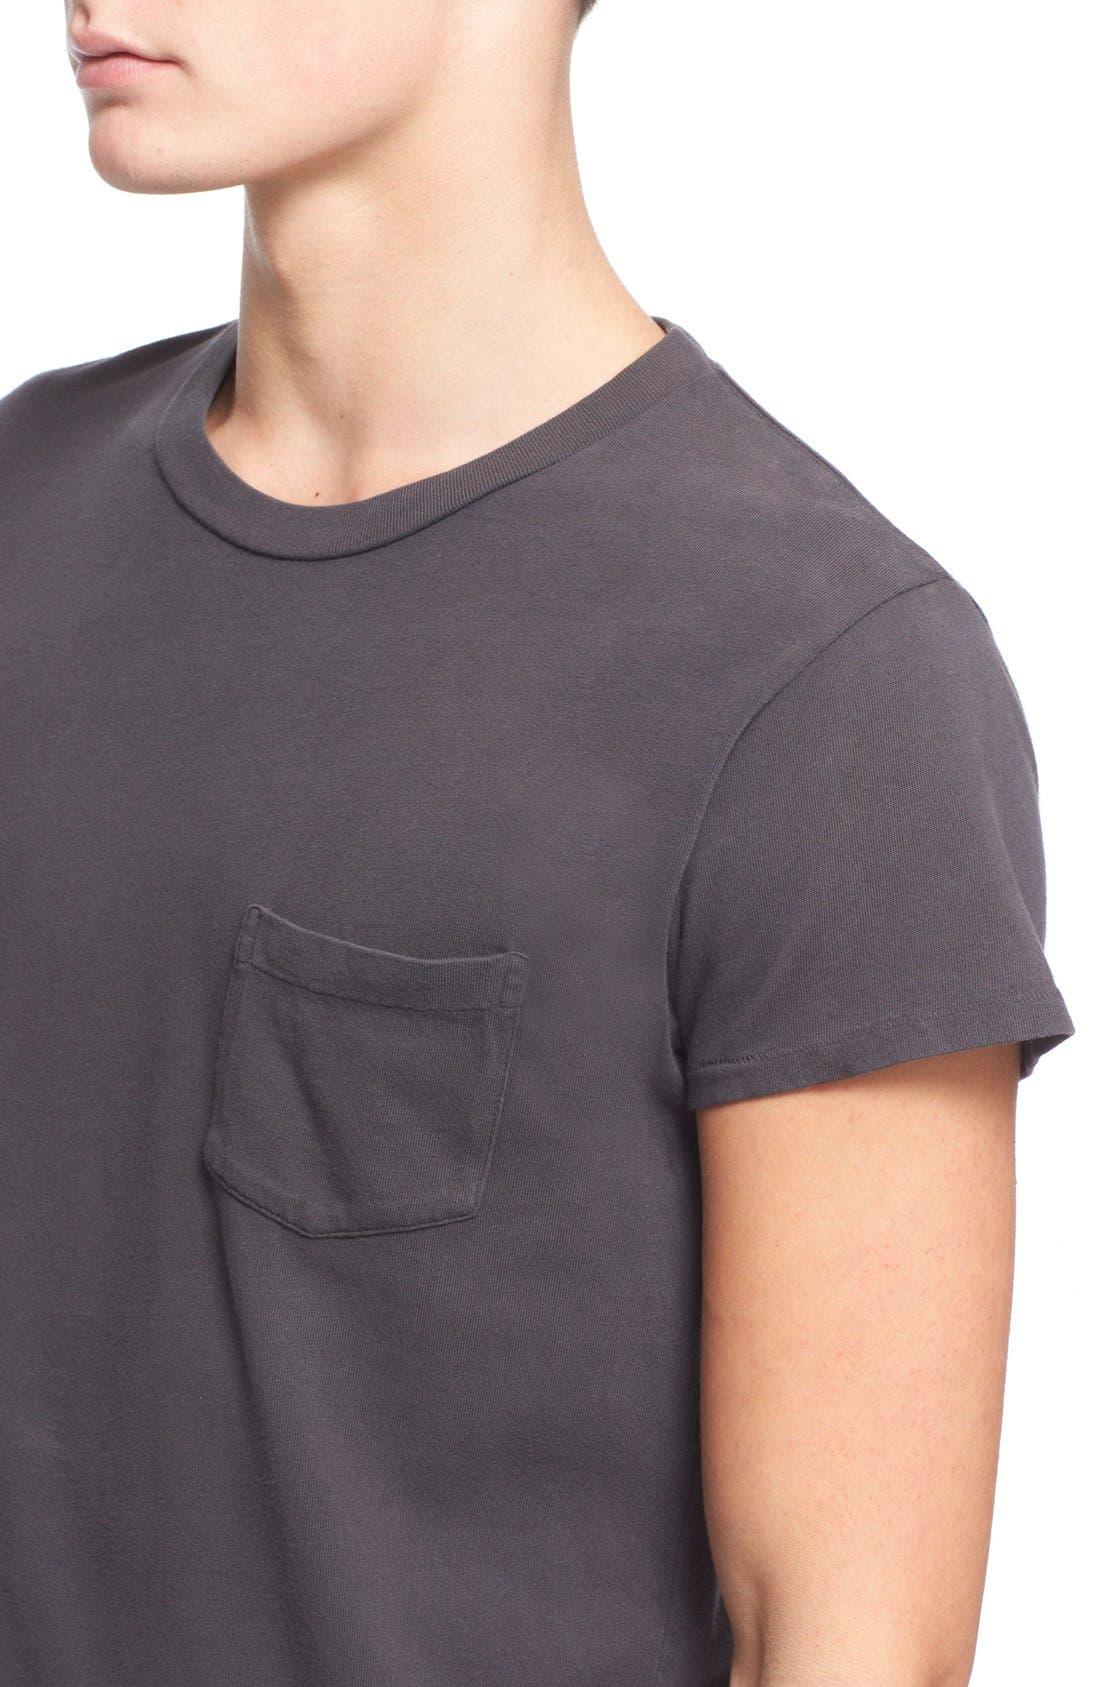 Levi's Vintage Clothing '1950s' Pocket T-Shirt,                             Alternate thumbnail 4, color,                             Black